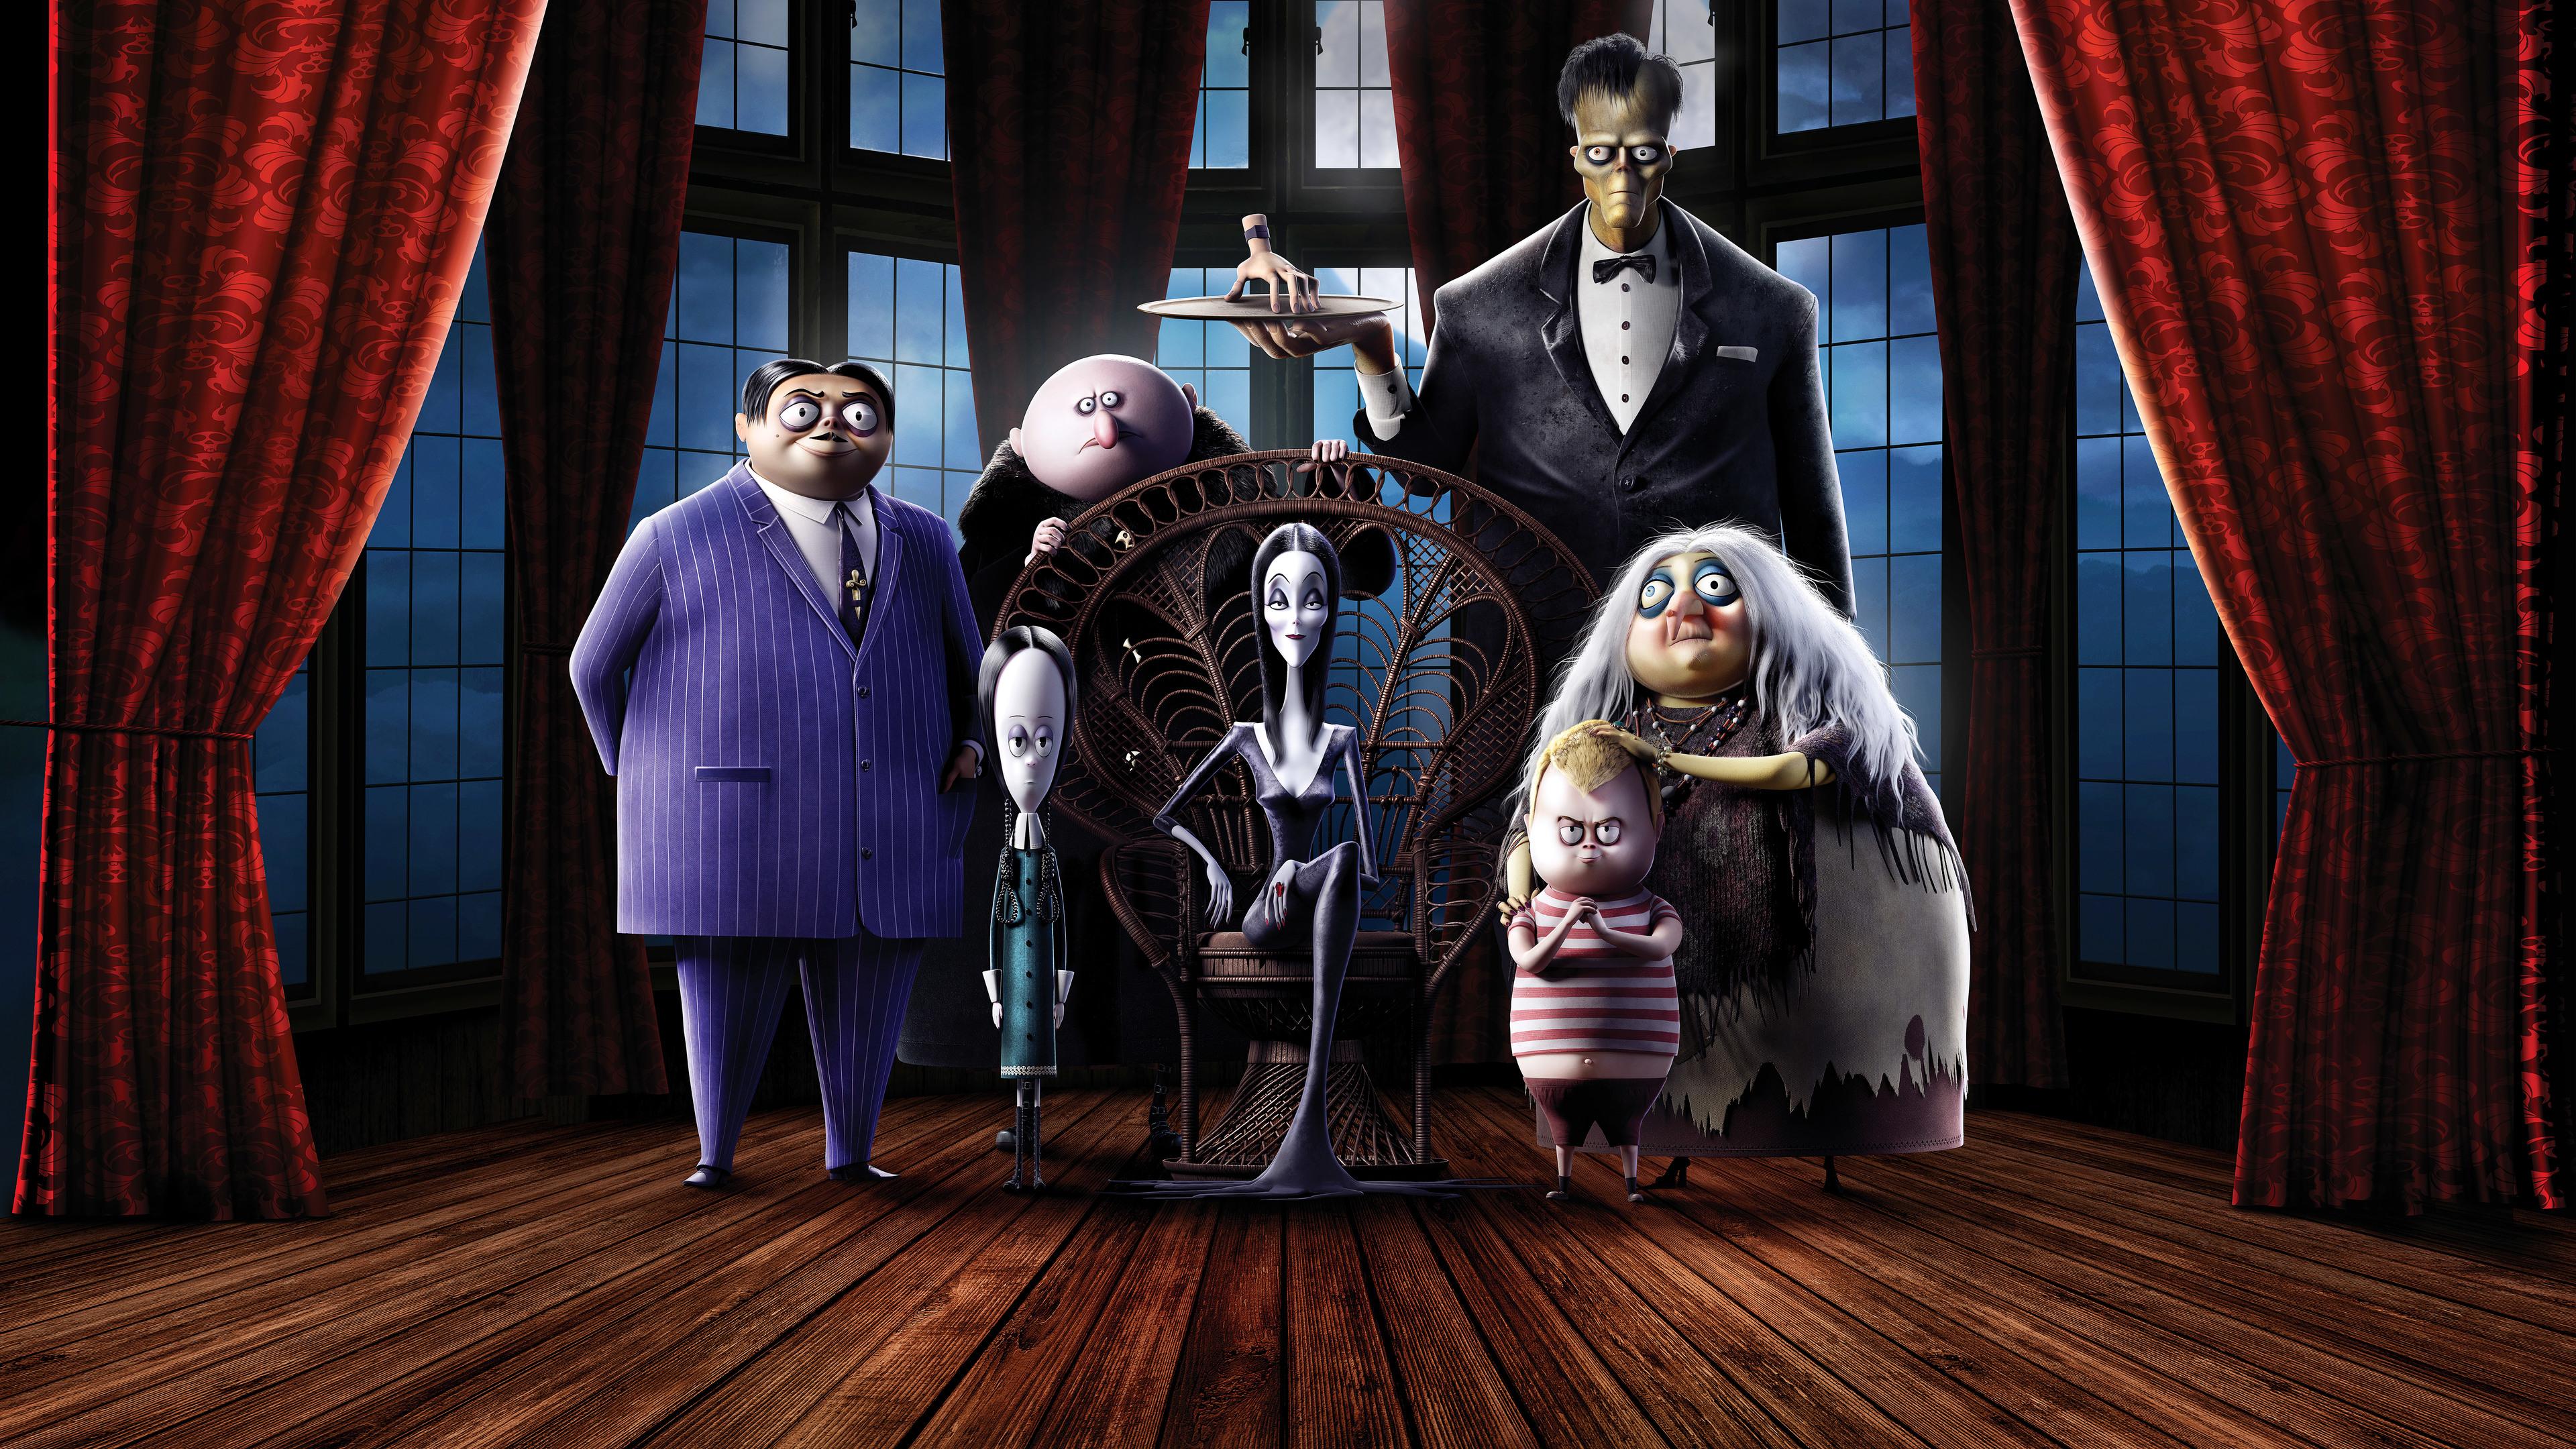 the addams family movie 2019 1570395349 - The Addams Family Movie 2019 - the addams family wallpapers, movies wallpapers, hd-wallpapers, 8k wallpapers, 5k wallpapers, 4k-wallpapers, 2019 movies wallpapers